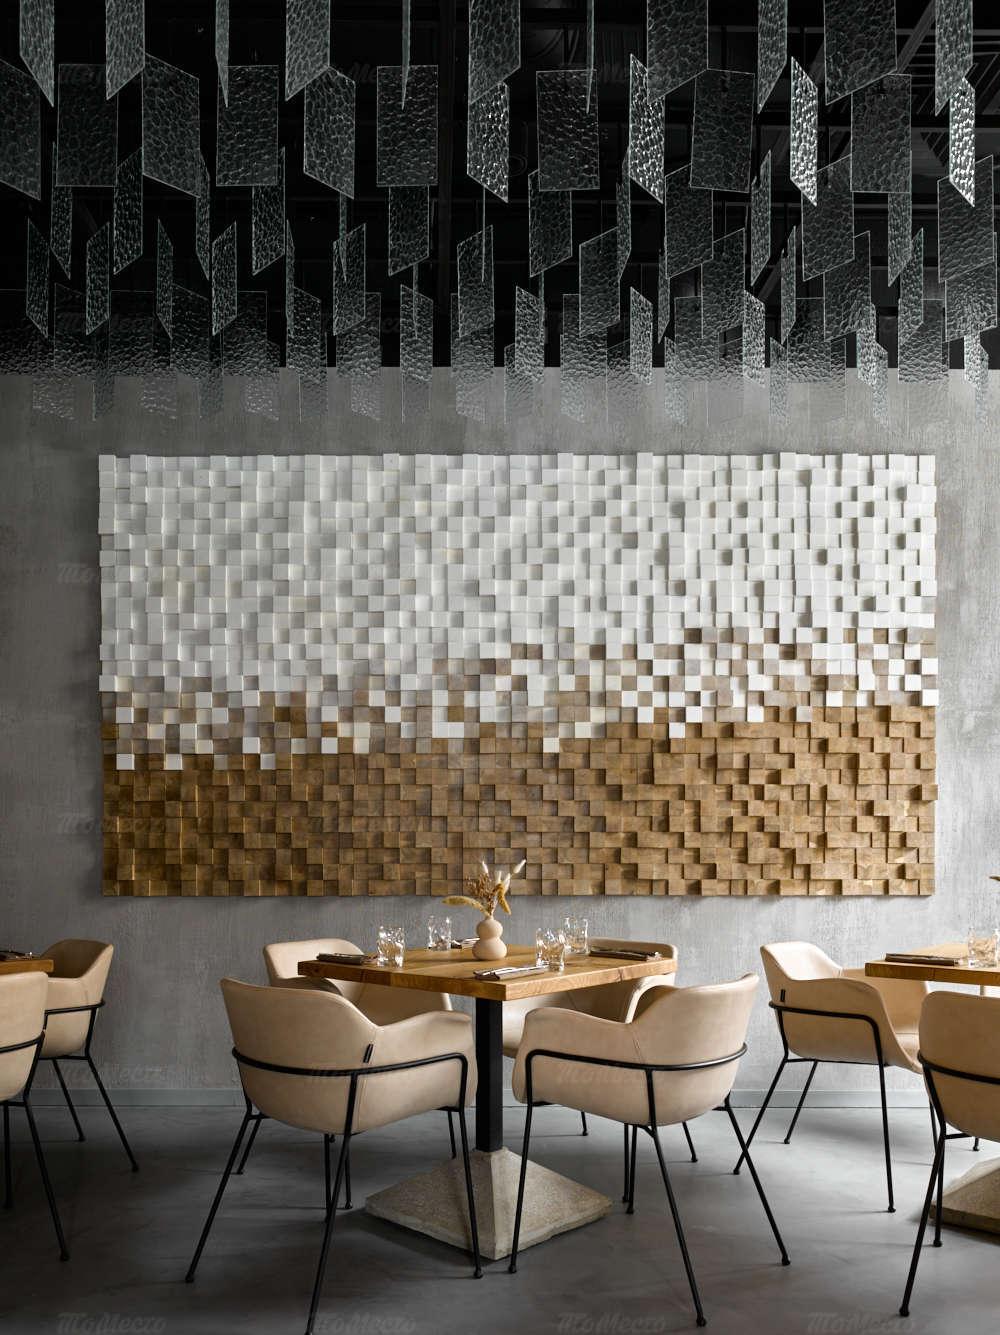 Ресторан Asia Inn (Азиа Инн) на бульваре Генерала Карбышева фото 8